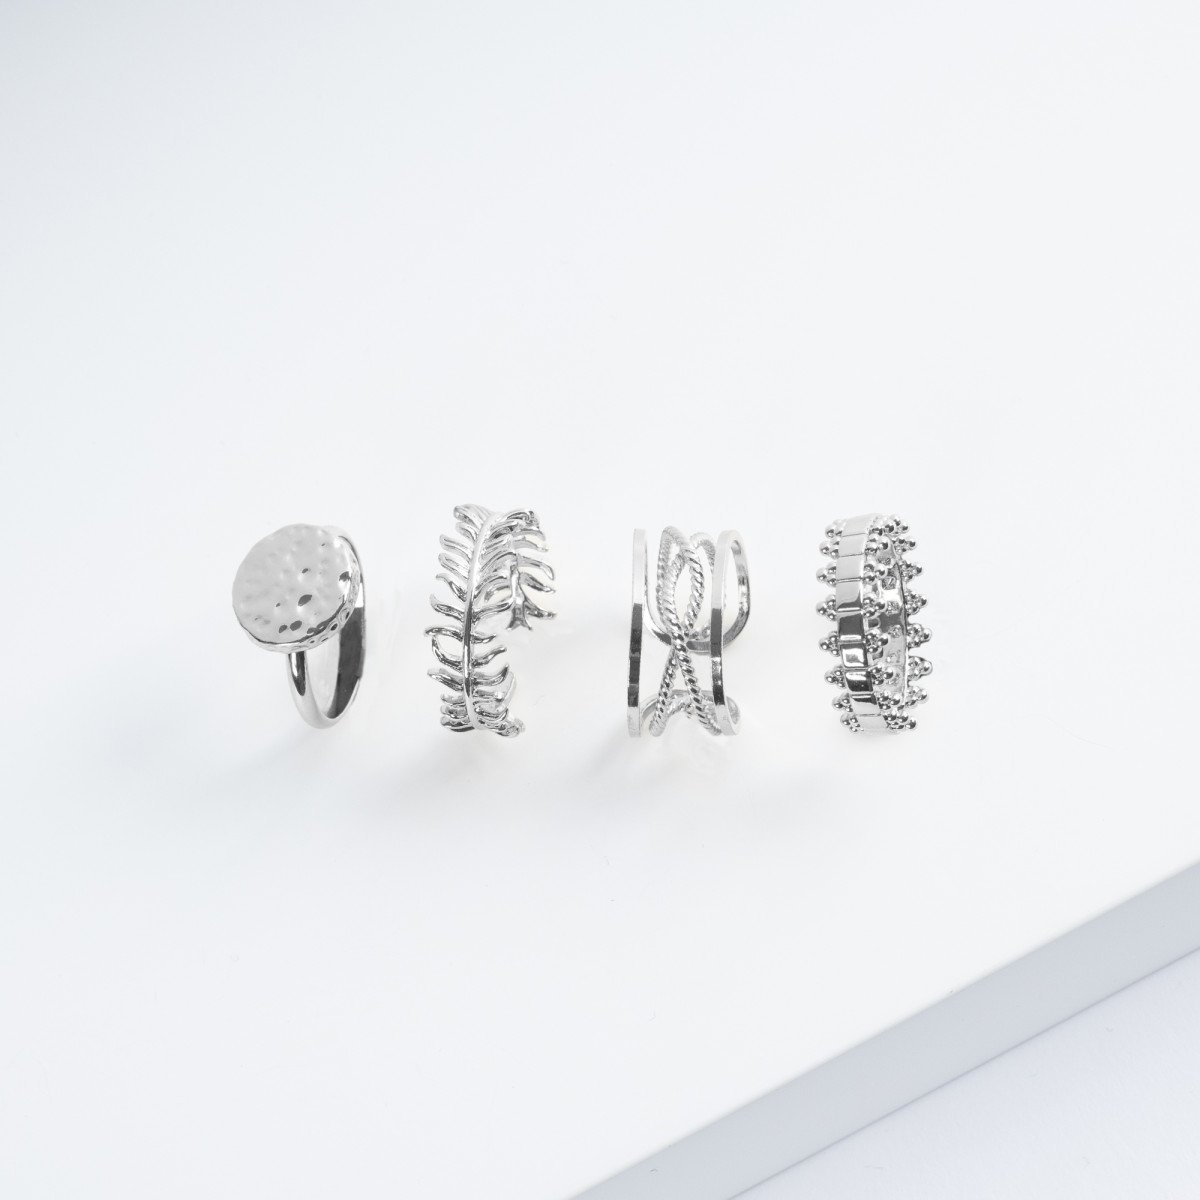 Kerze mit Silberner Ring | Abb